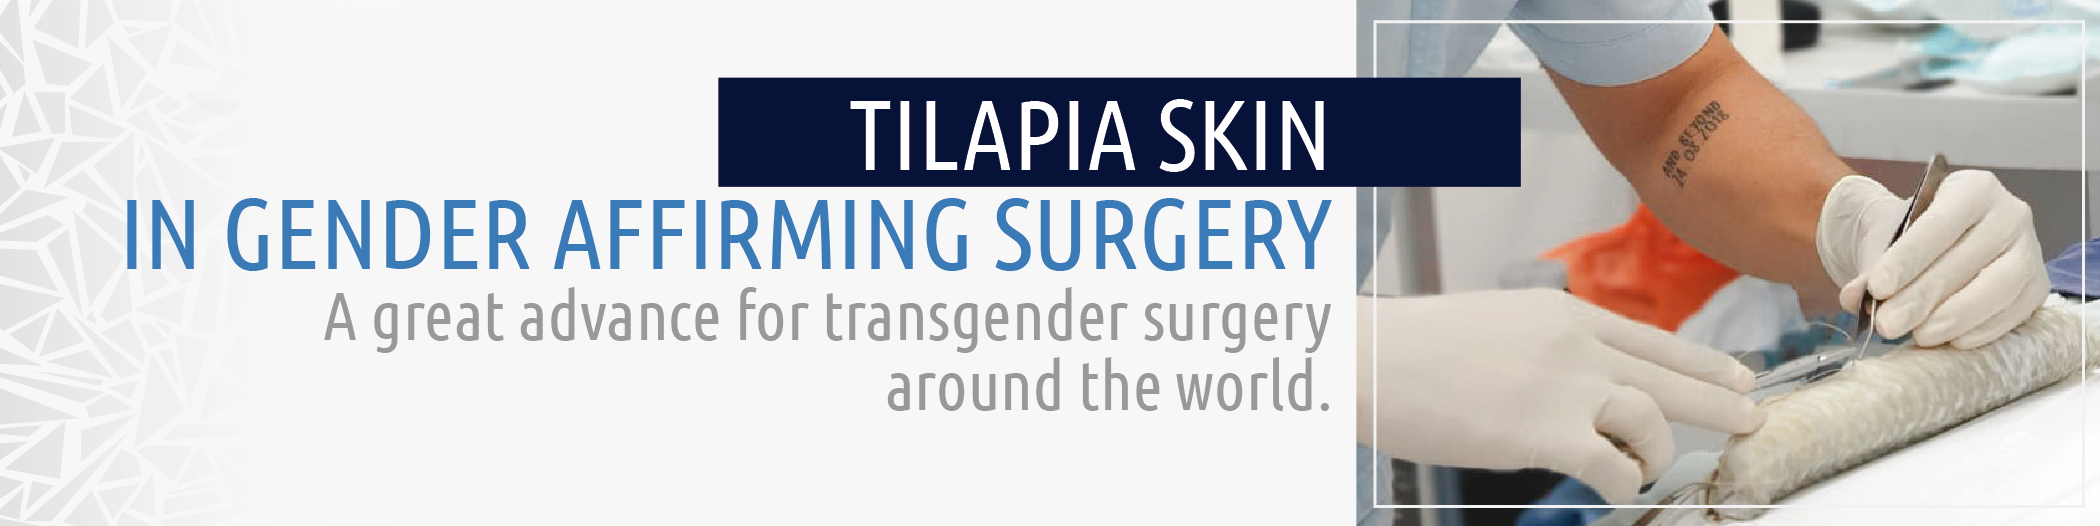 Tilapia Skin   CECM Colombia - Dr. Álvaro Hernán Rodriguez